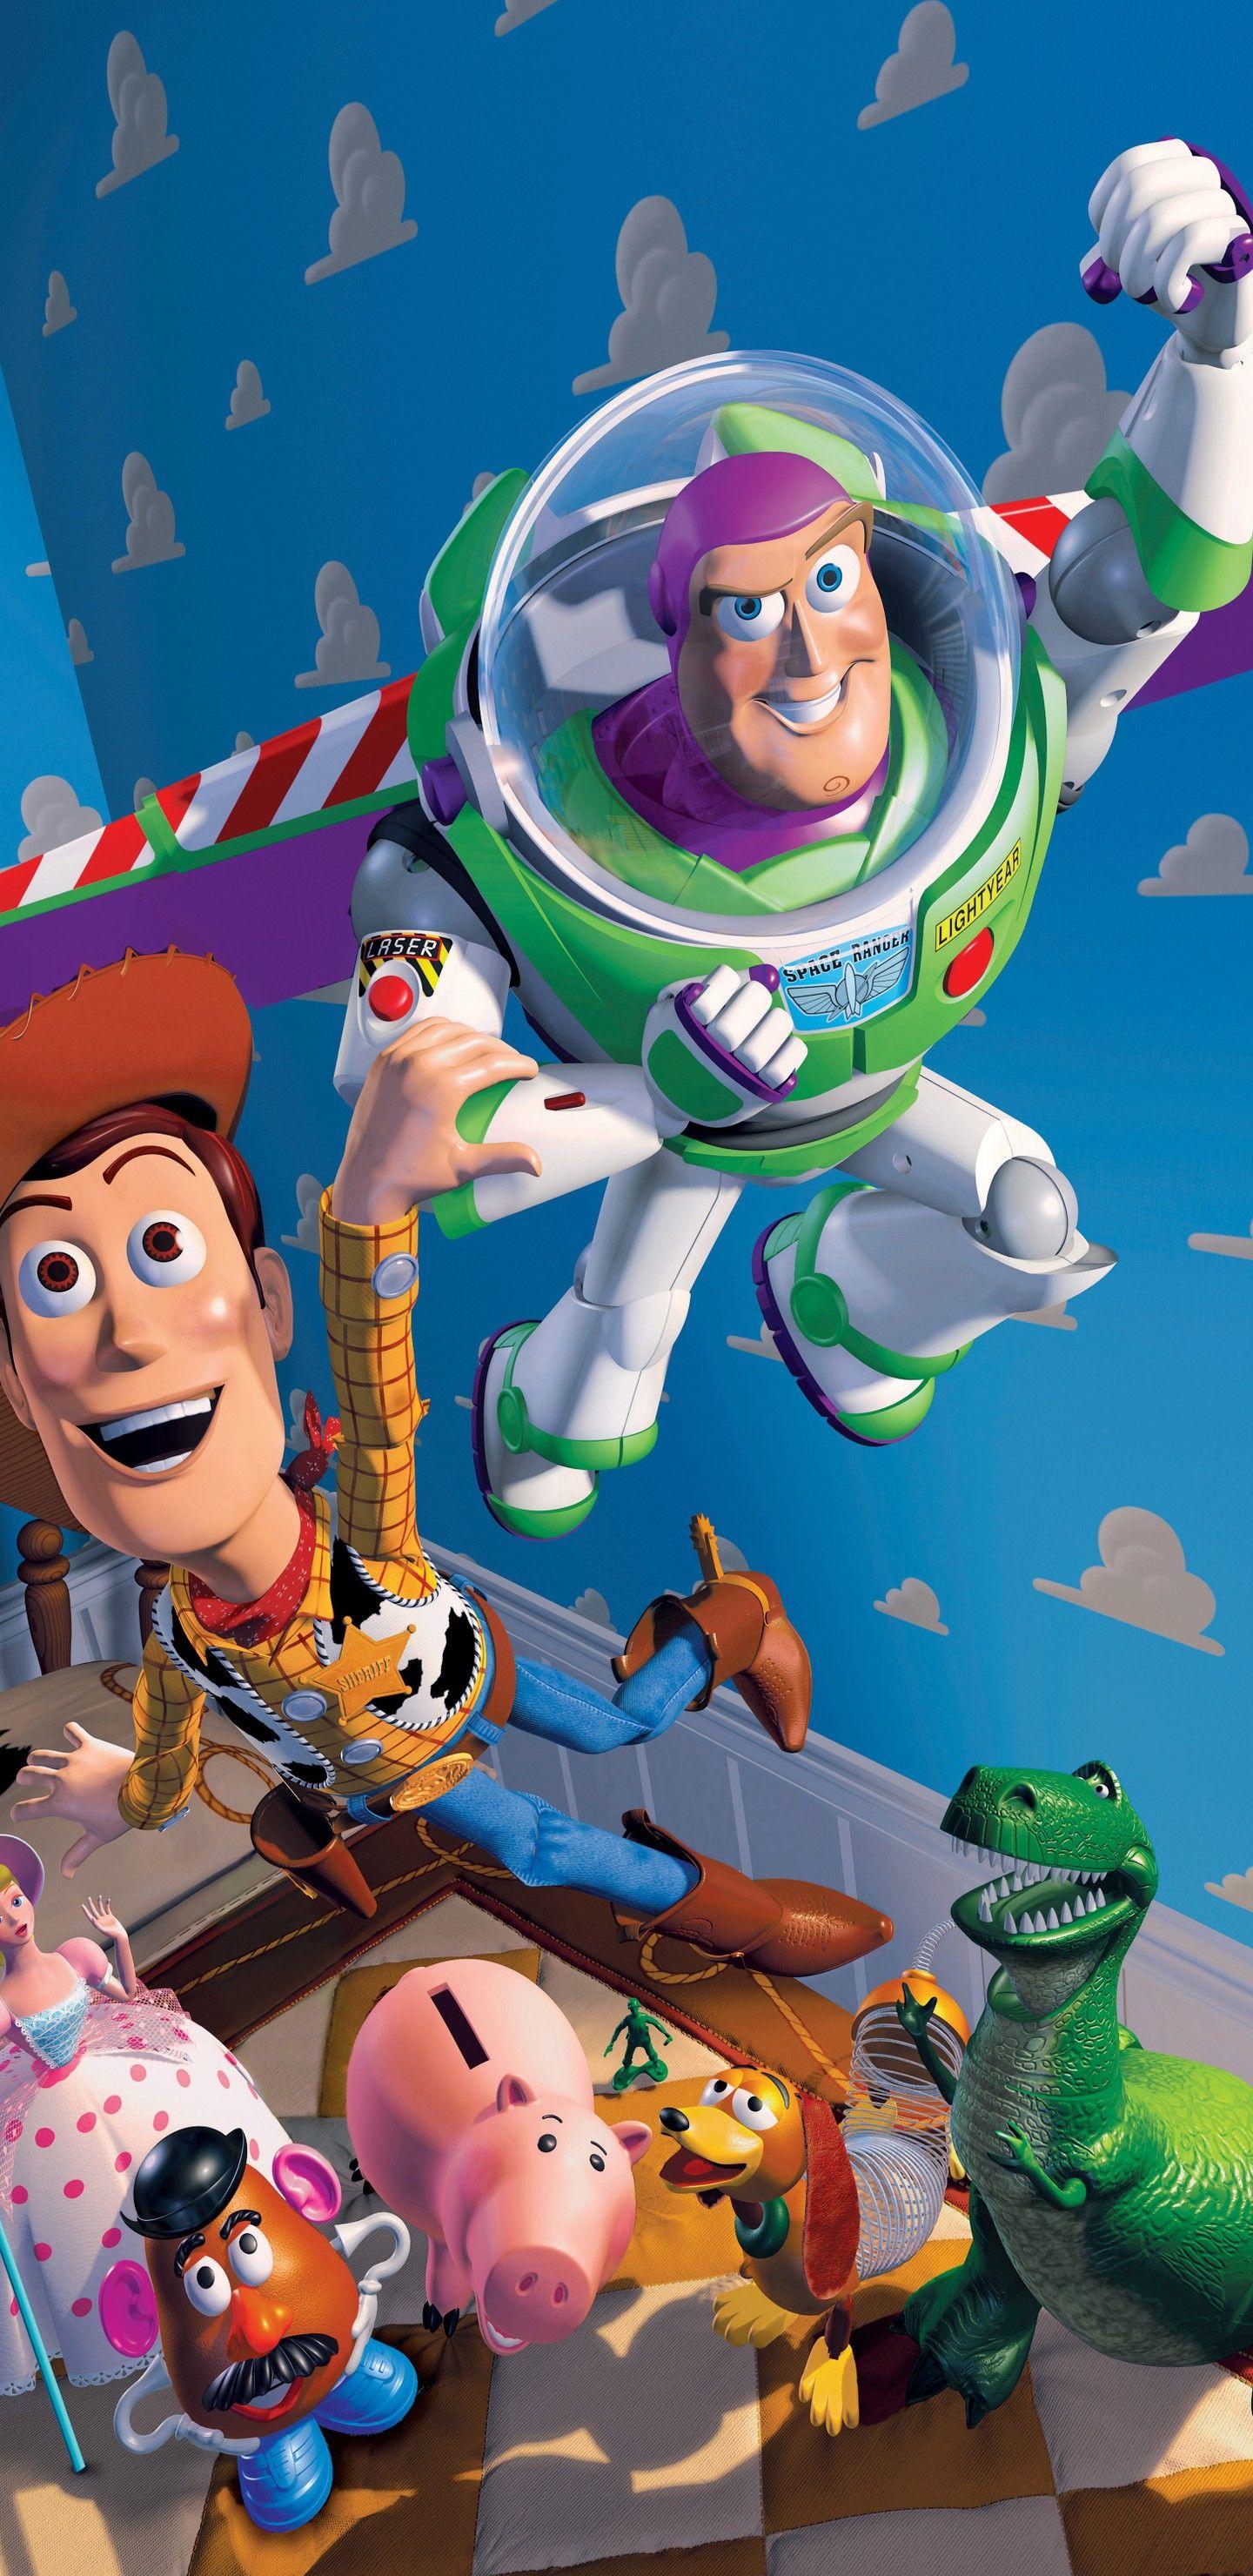 Toy Story 1995 Disney In 2018 Pinterest Keripik Singkong By Nyamen Pgp